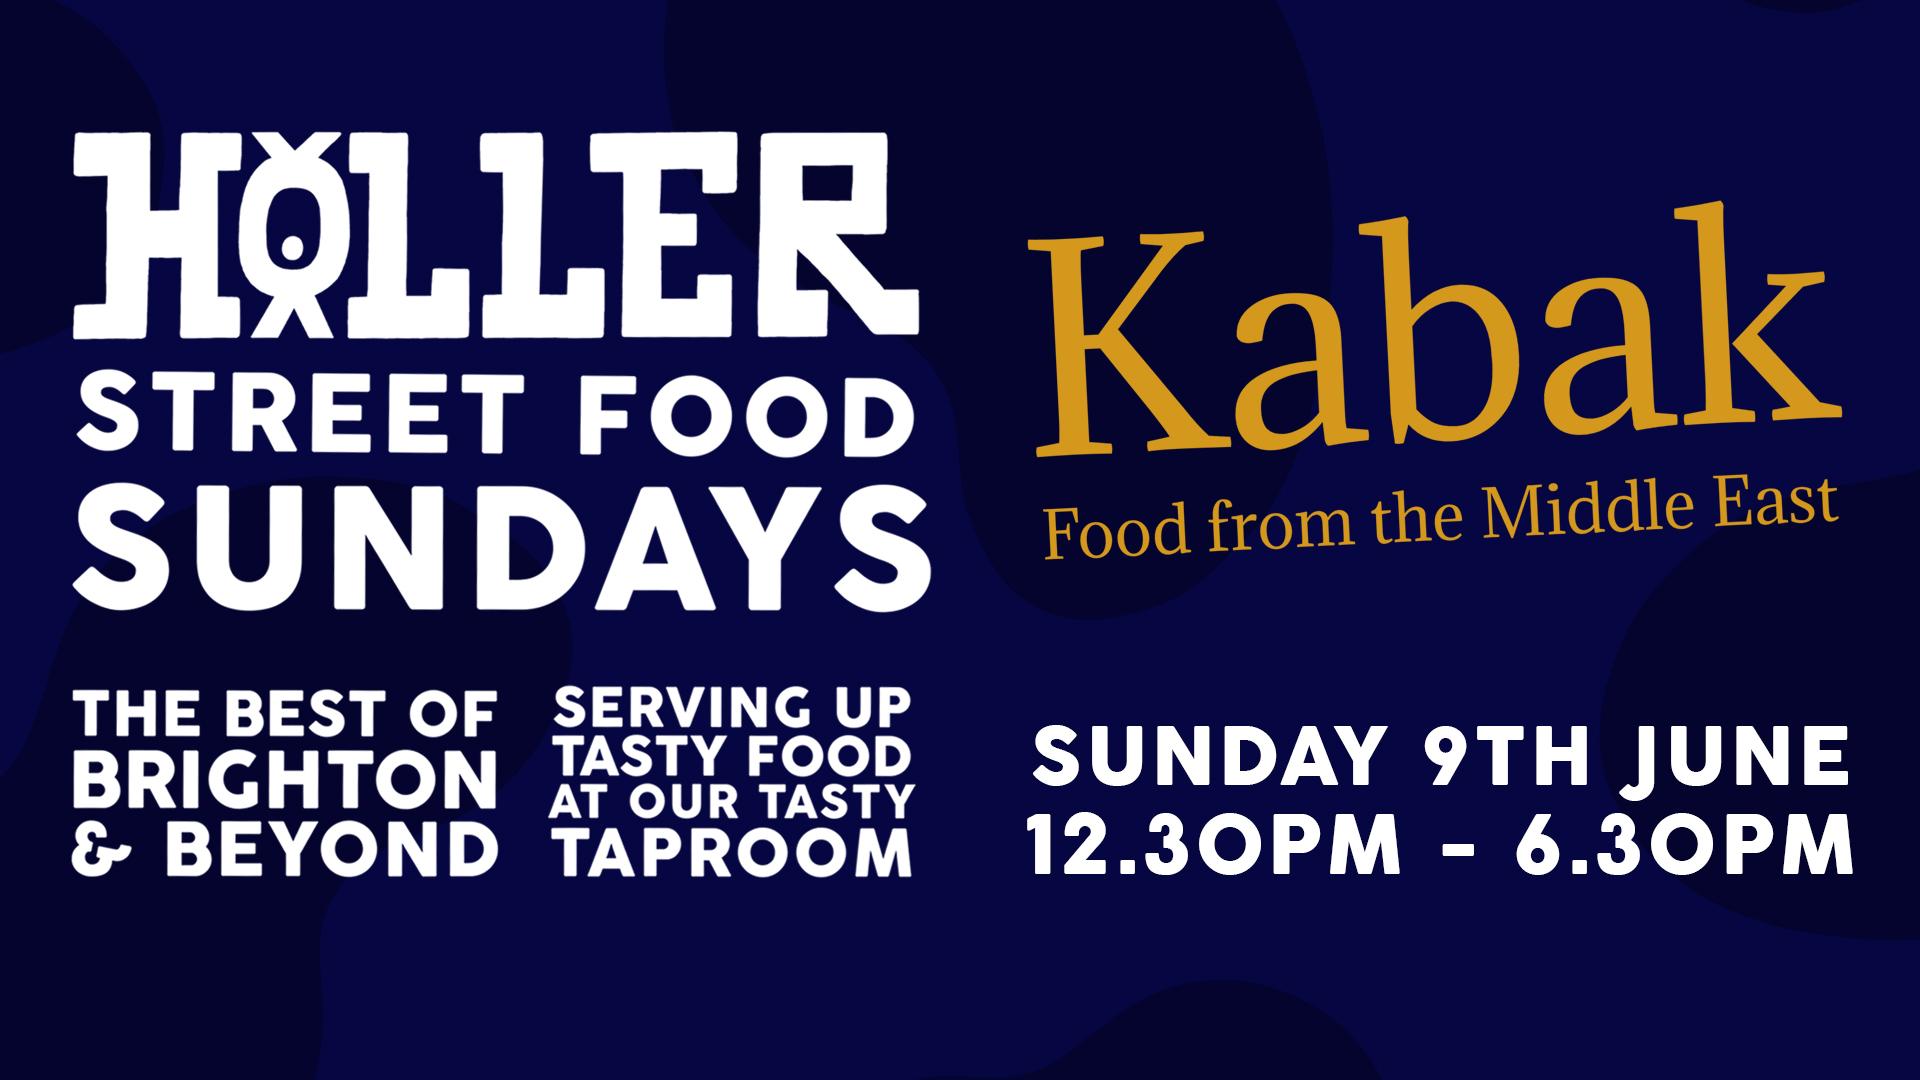 Holler-street-food-sundays-brewery-taproom-kabak.jpg